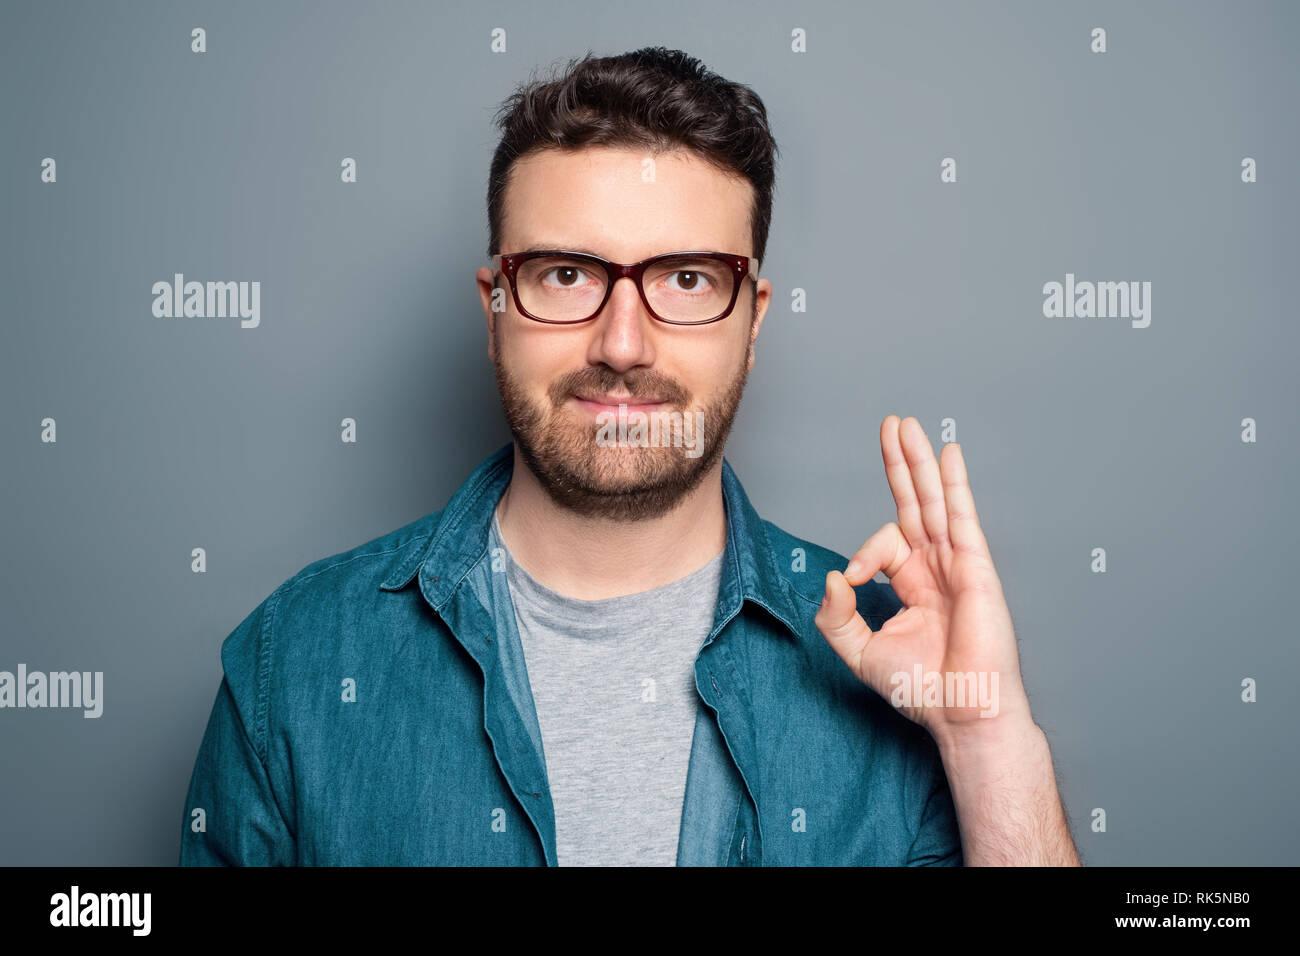 Man portrait making ok gesture isolated on background - Stock Image